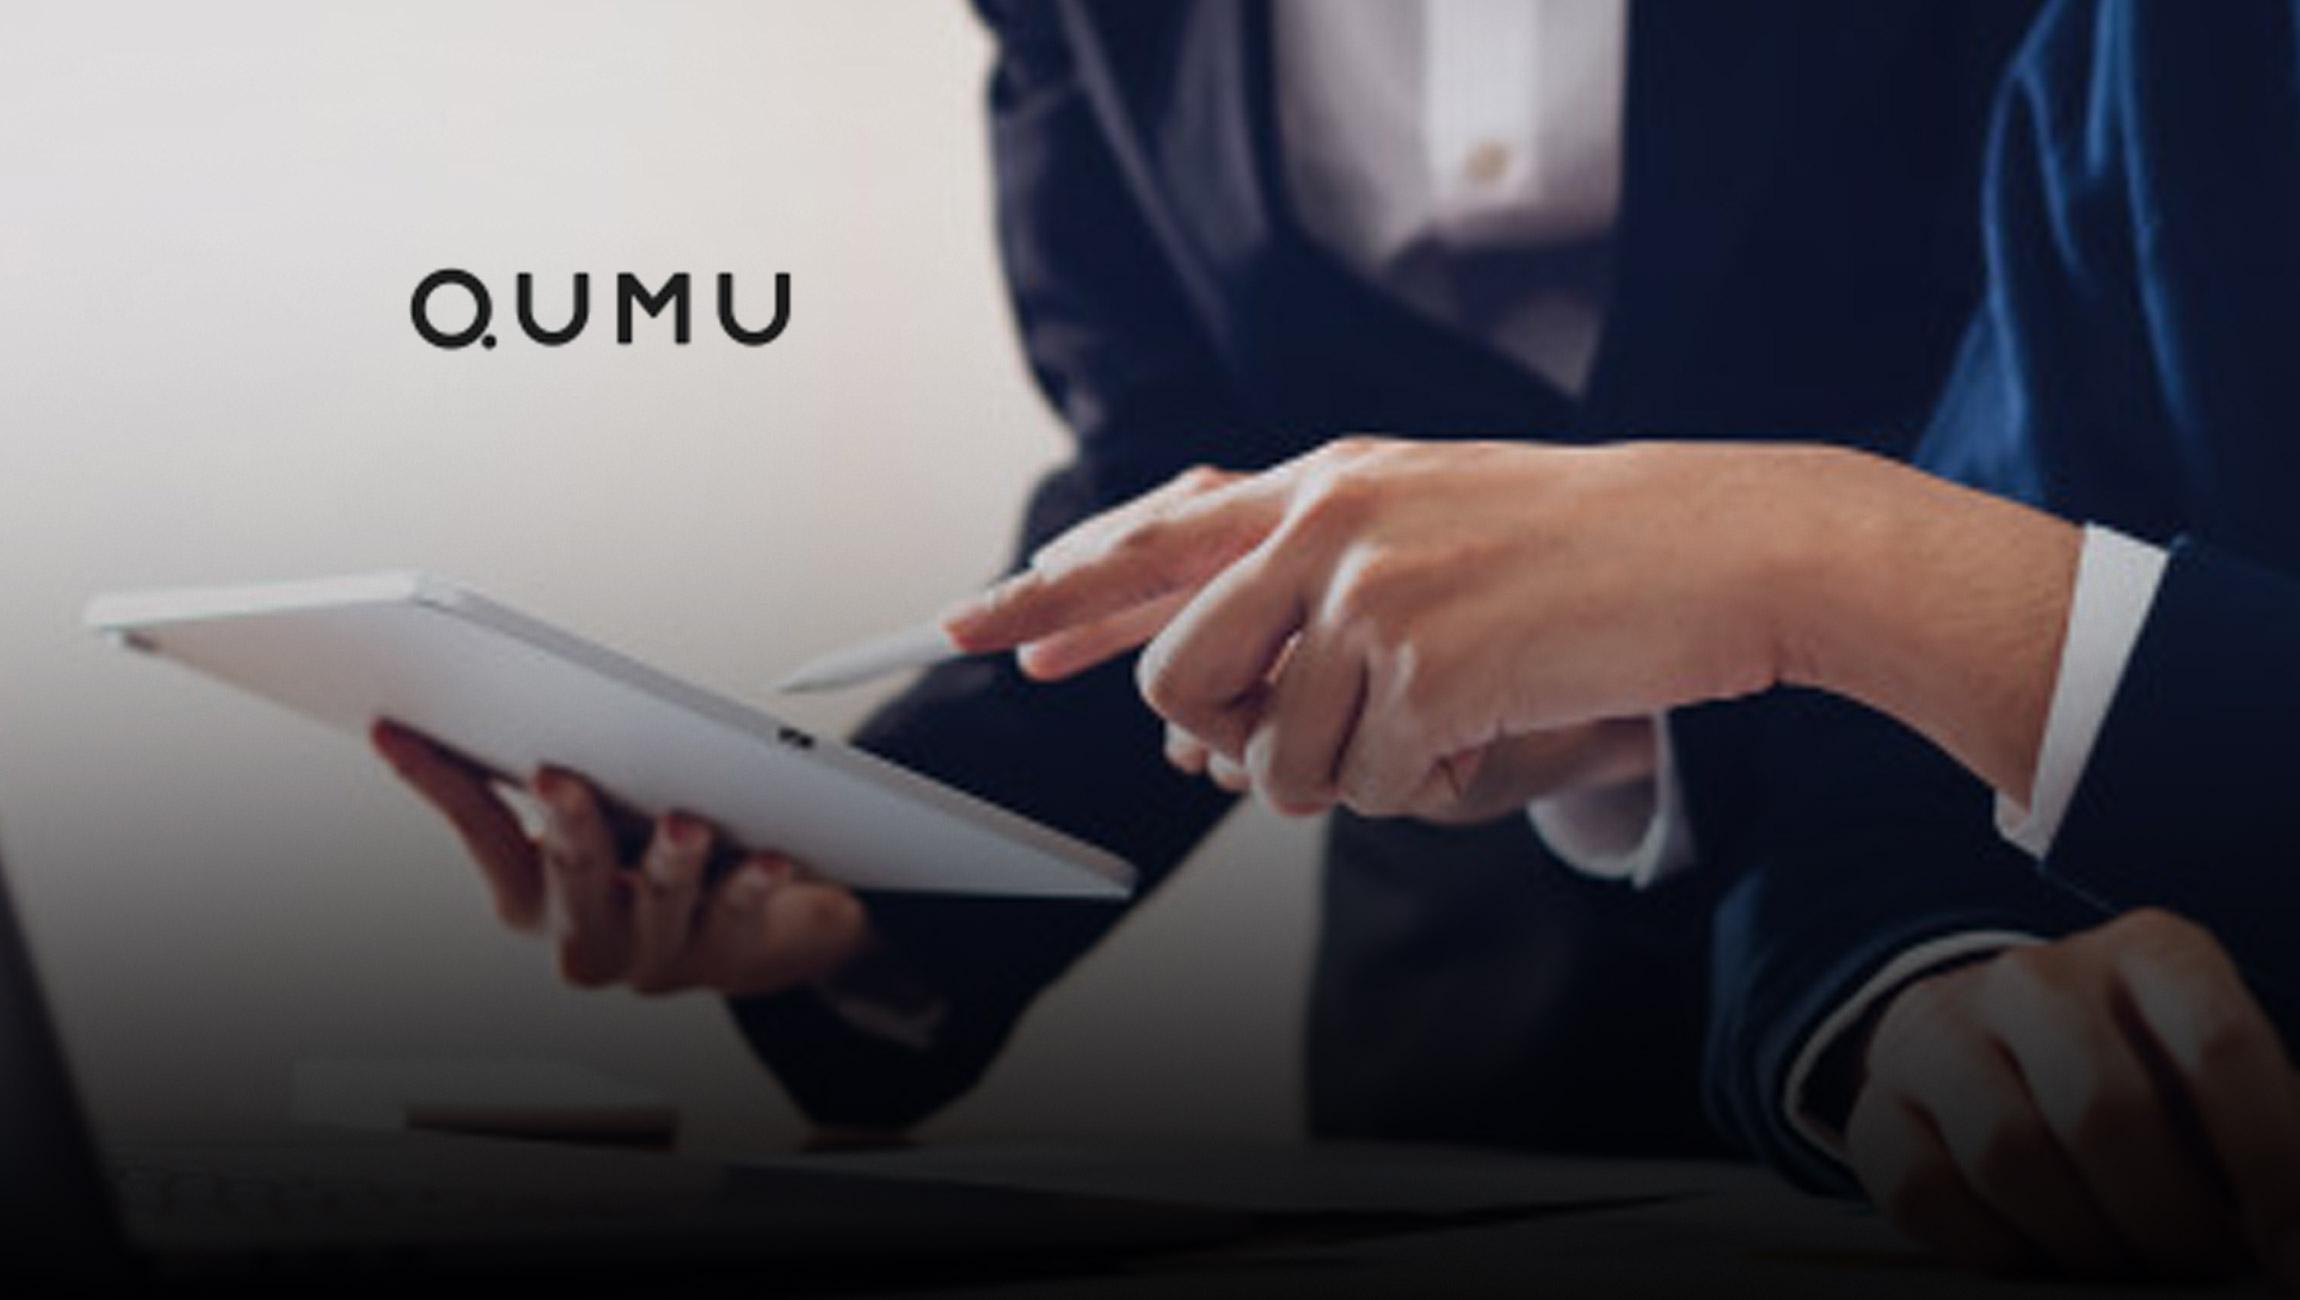 New Qumu App Transforms Zoom Into Large-Scale Broadcasting Platform for Enterprises